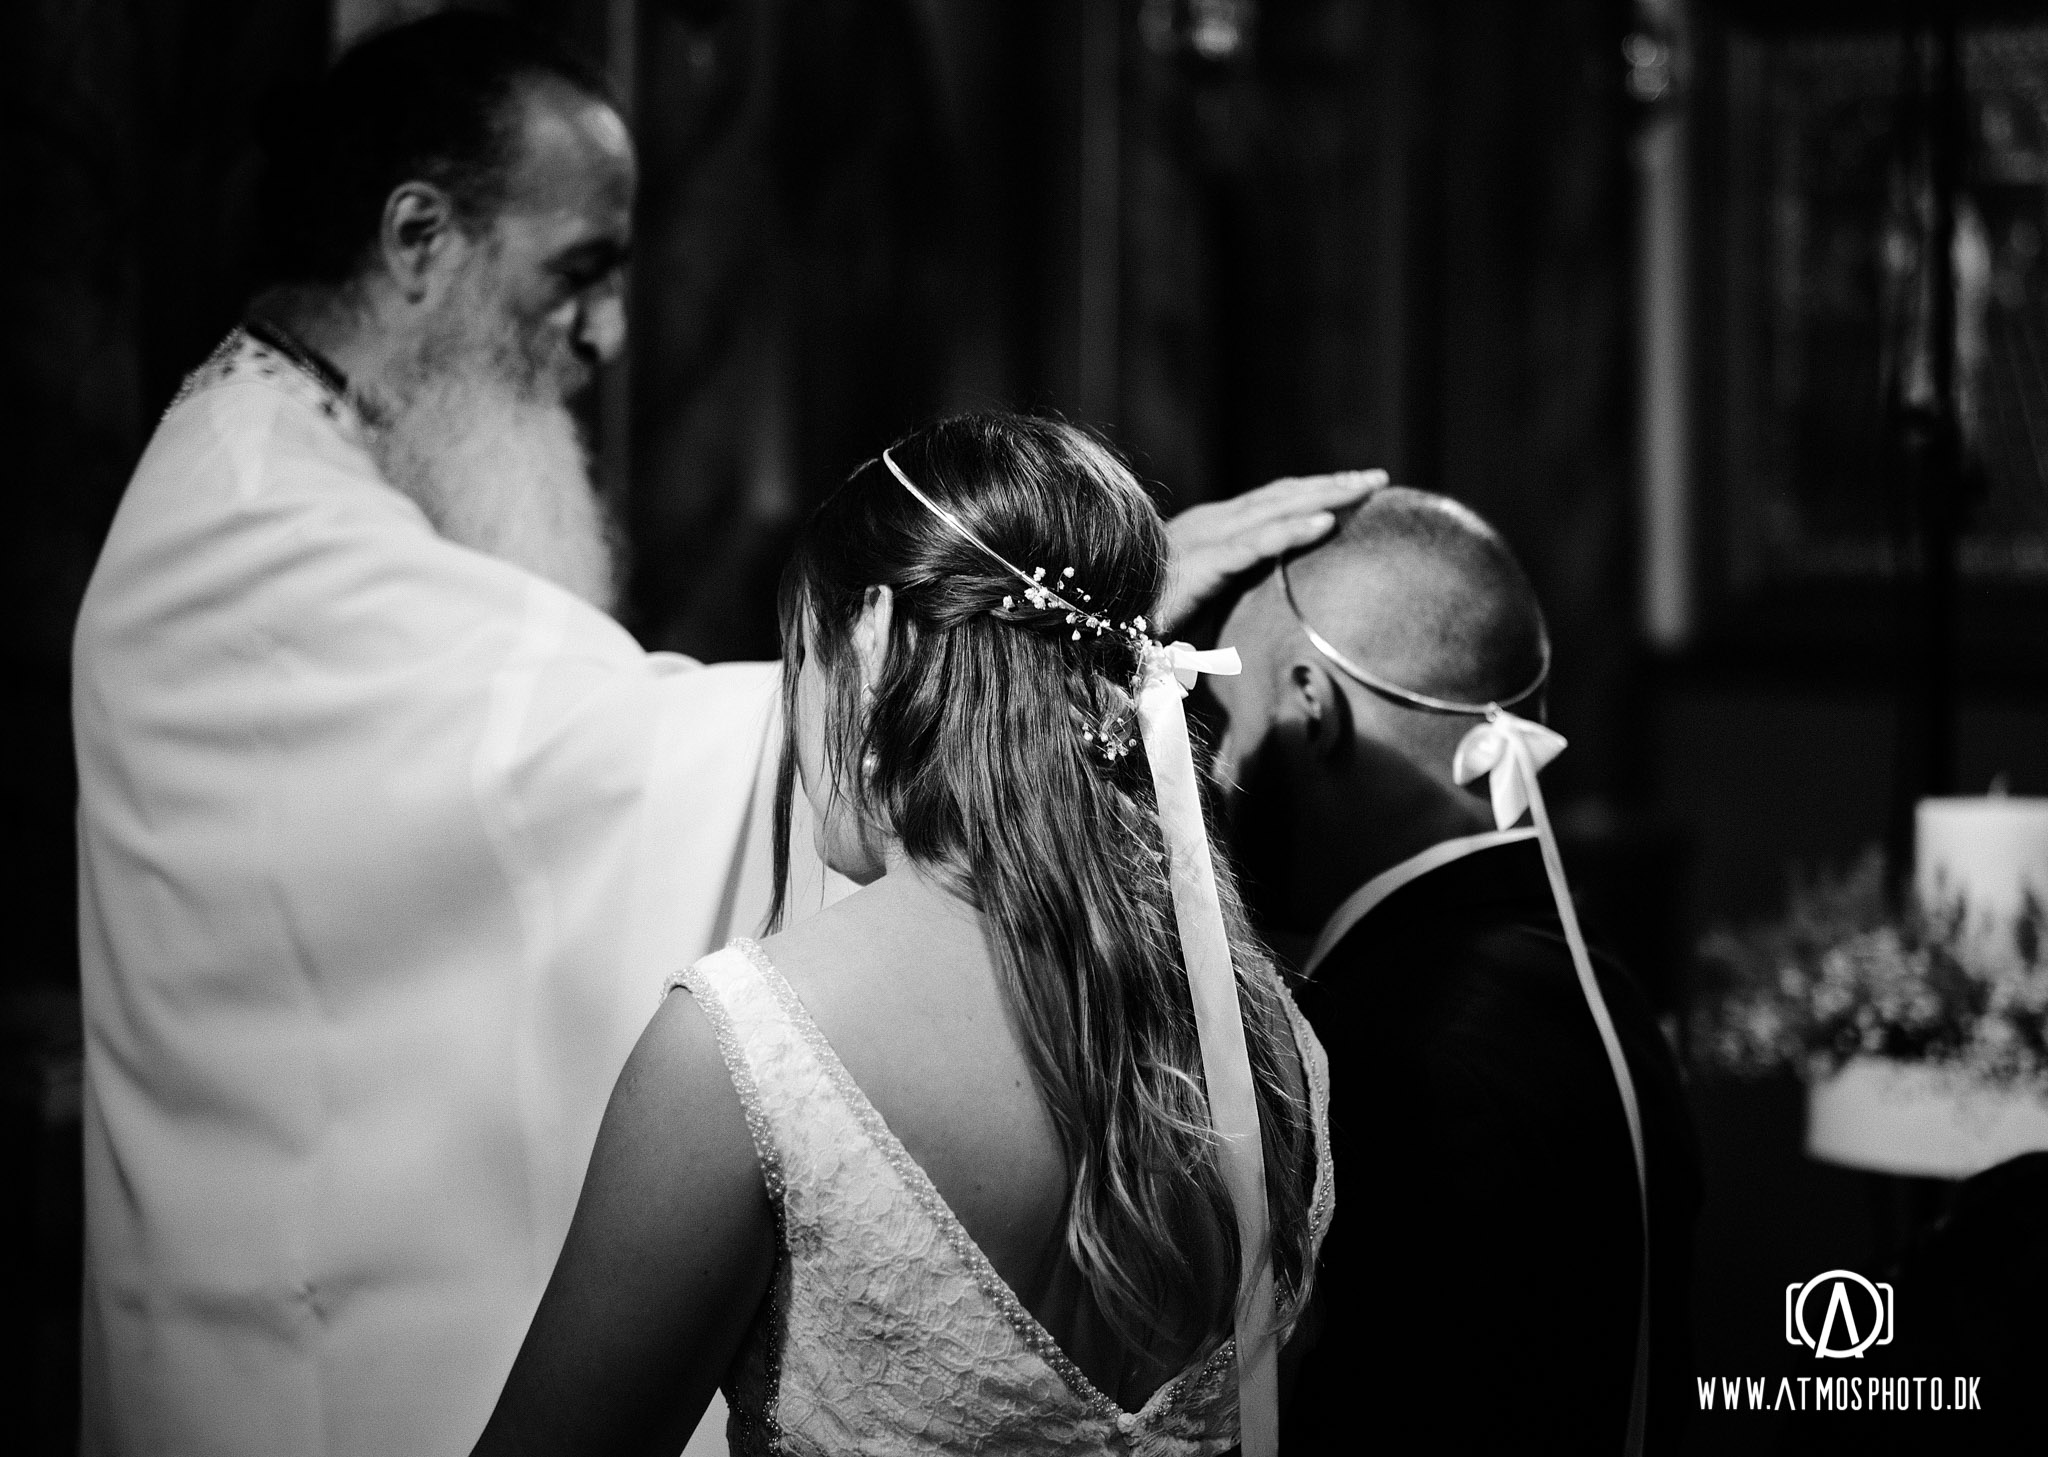 Wedding_AtmosPhoto_2048x-5.jpg